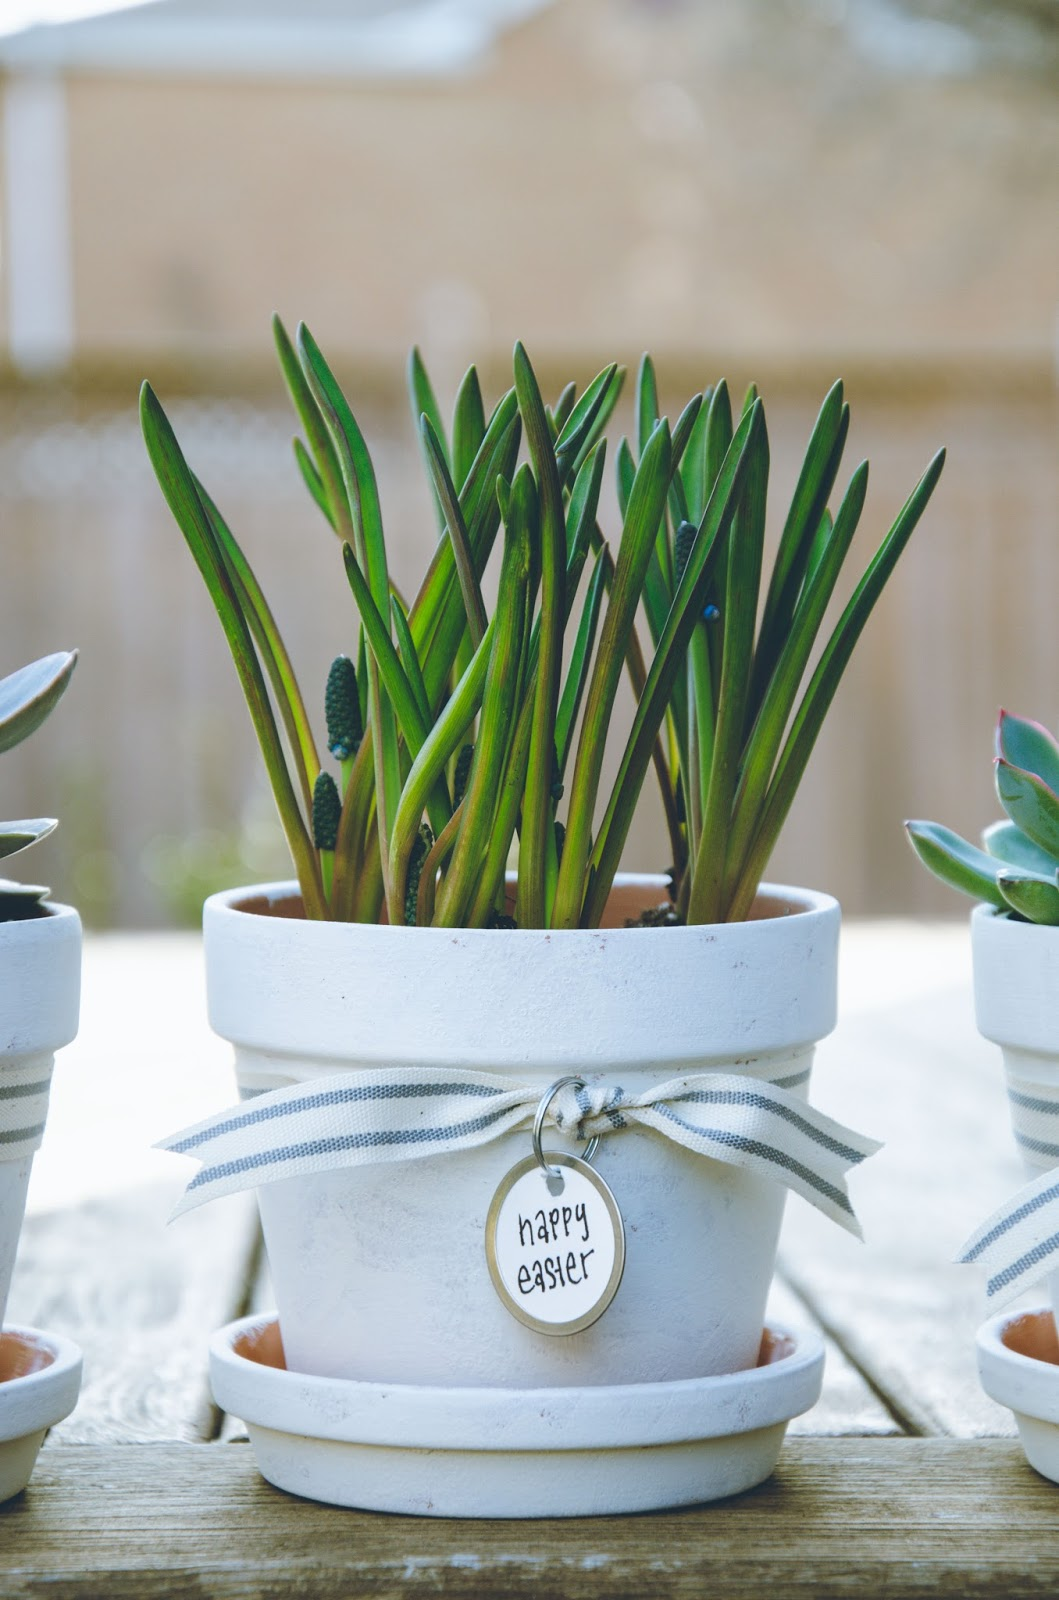 shabby chic personalized flowerpots | personally andrea: shabby